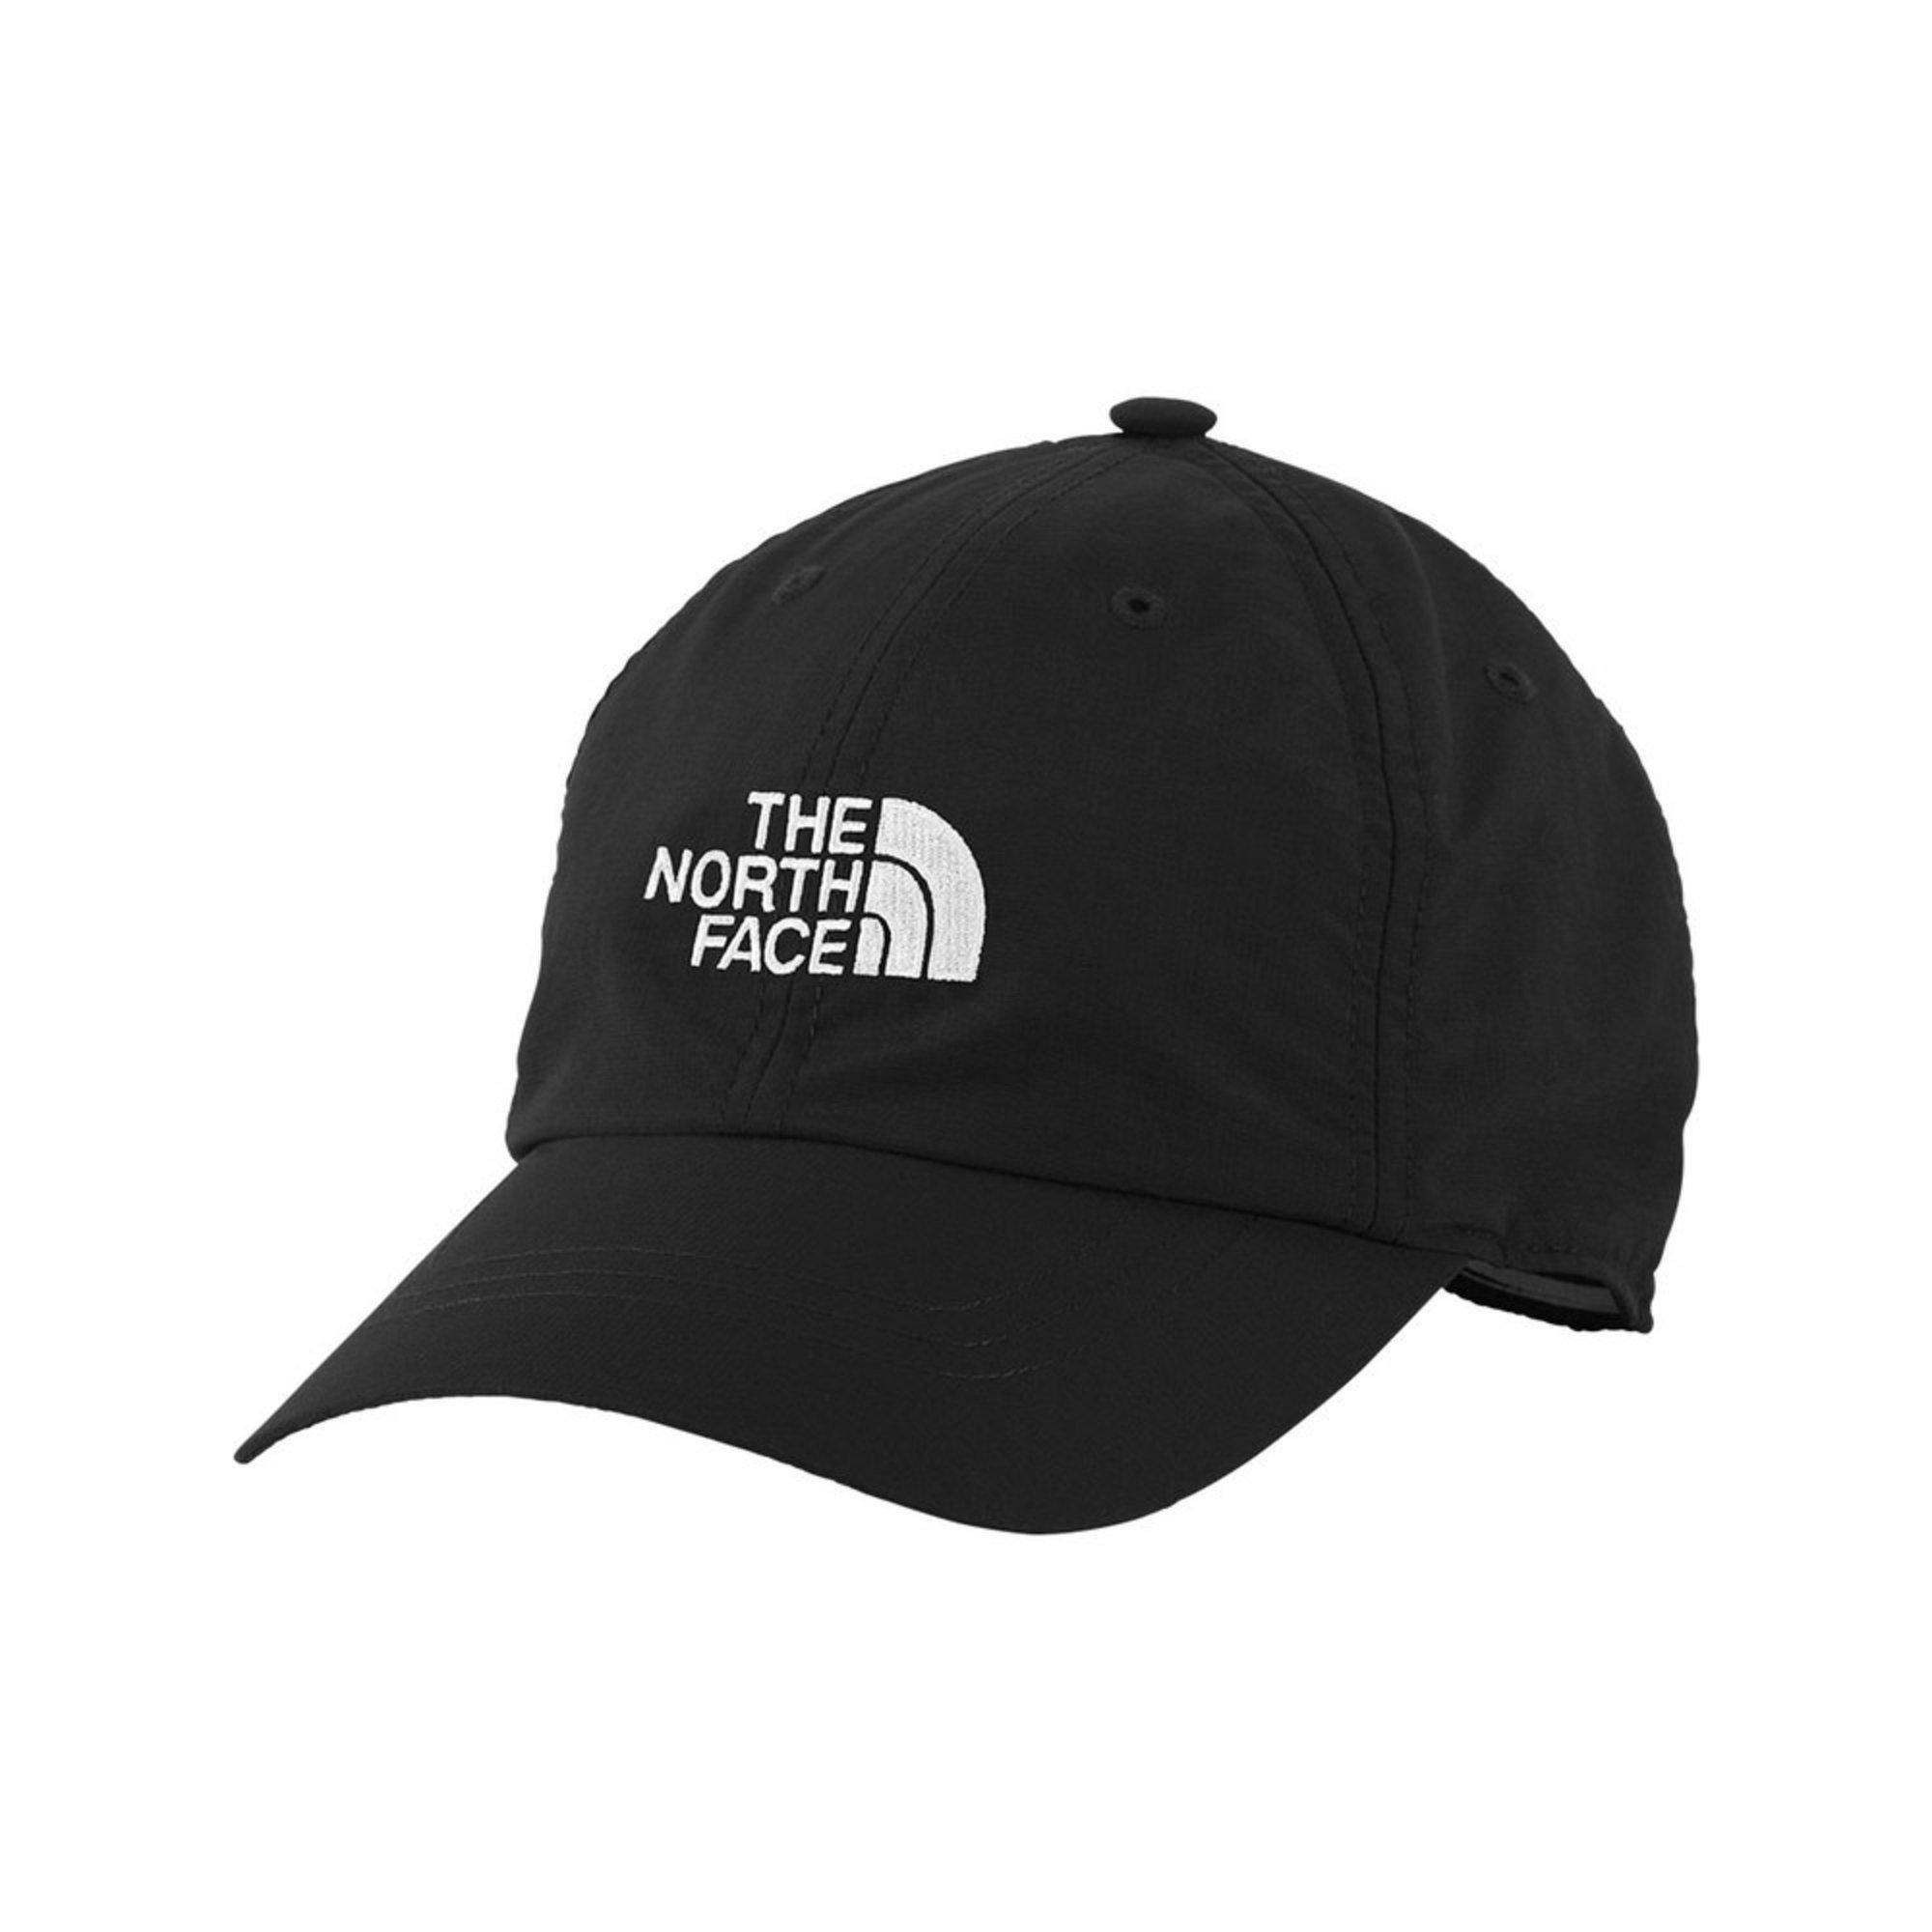 aa5465caa10 The North Face. The North Face Horizon Ball Cap